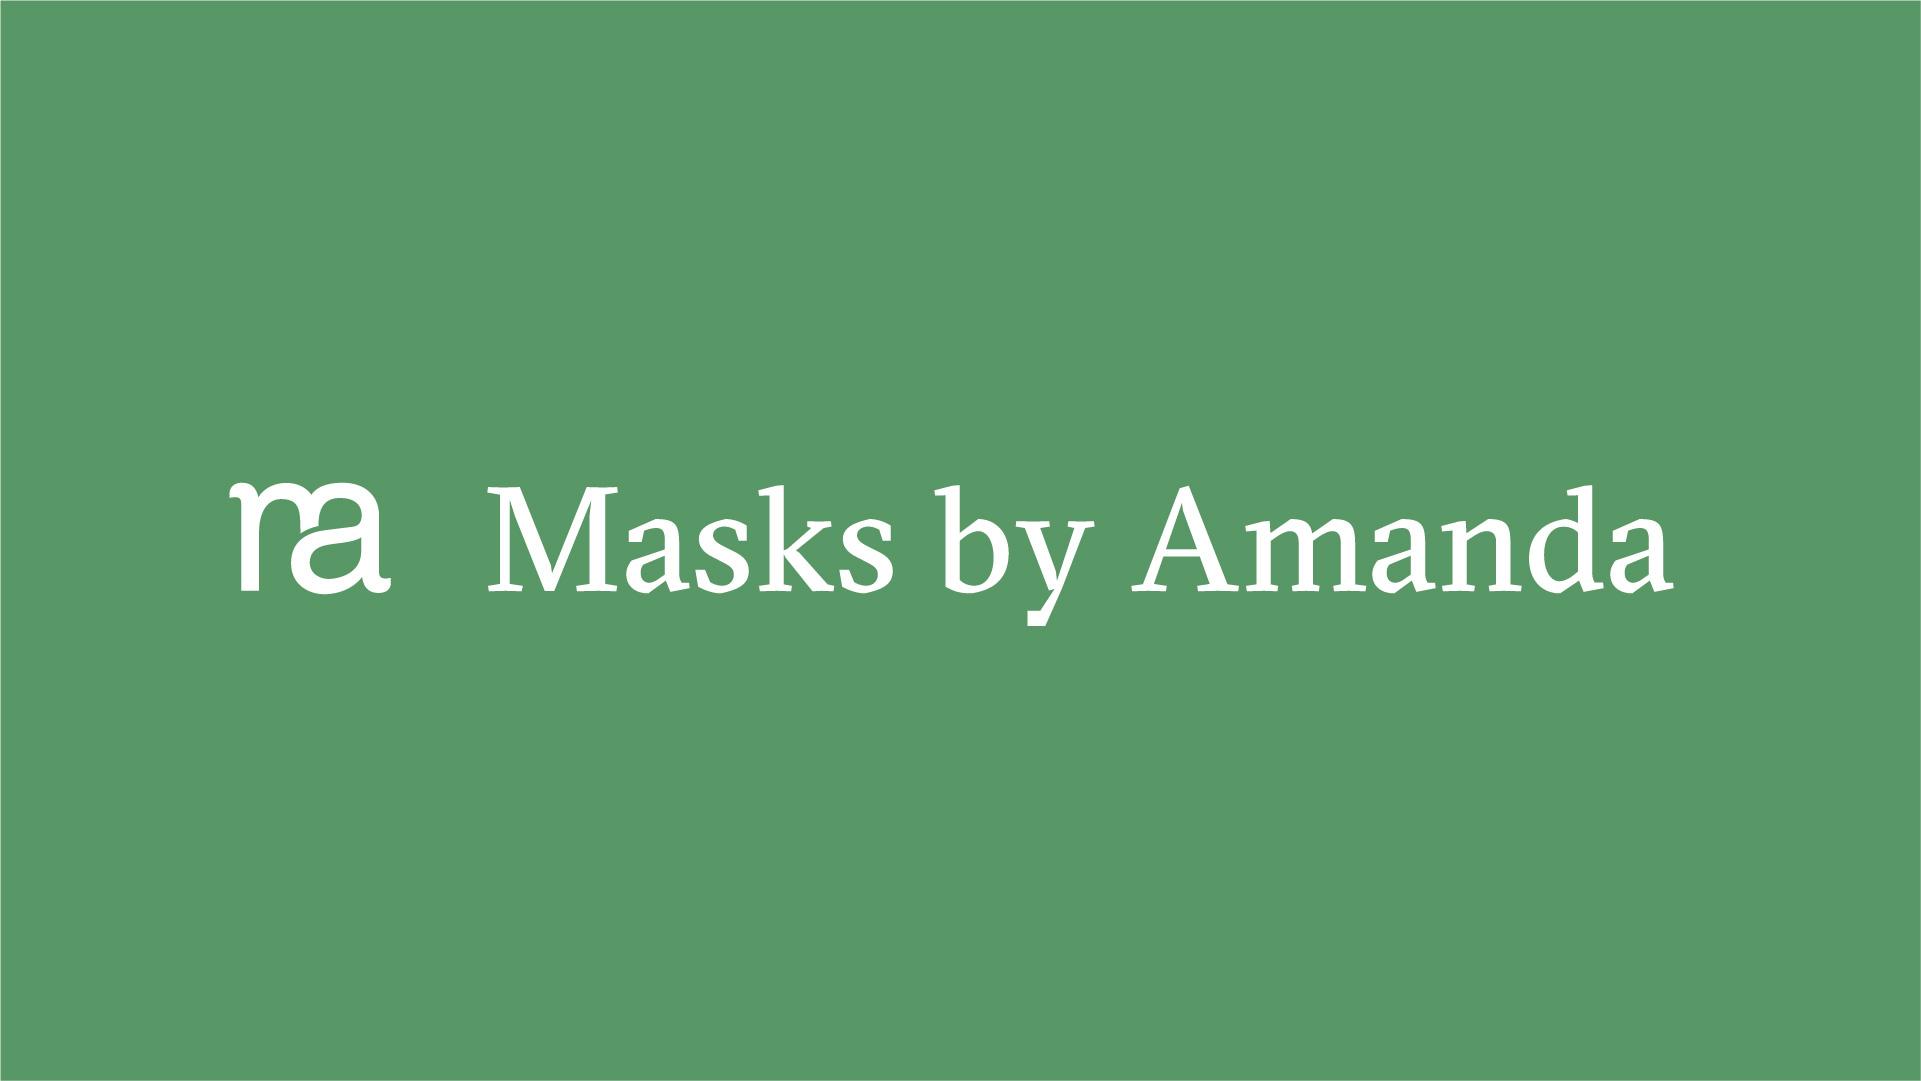 masks by amanda monogram and typography